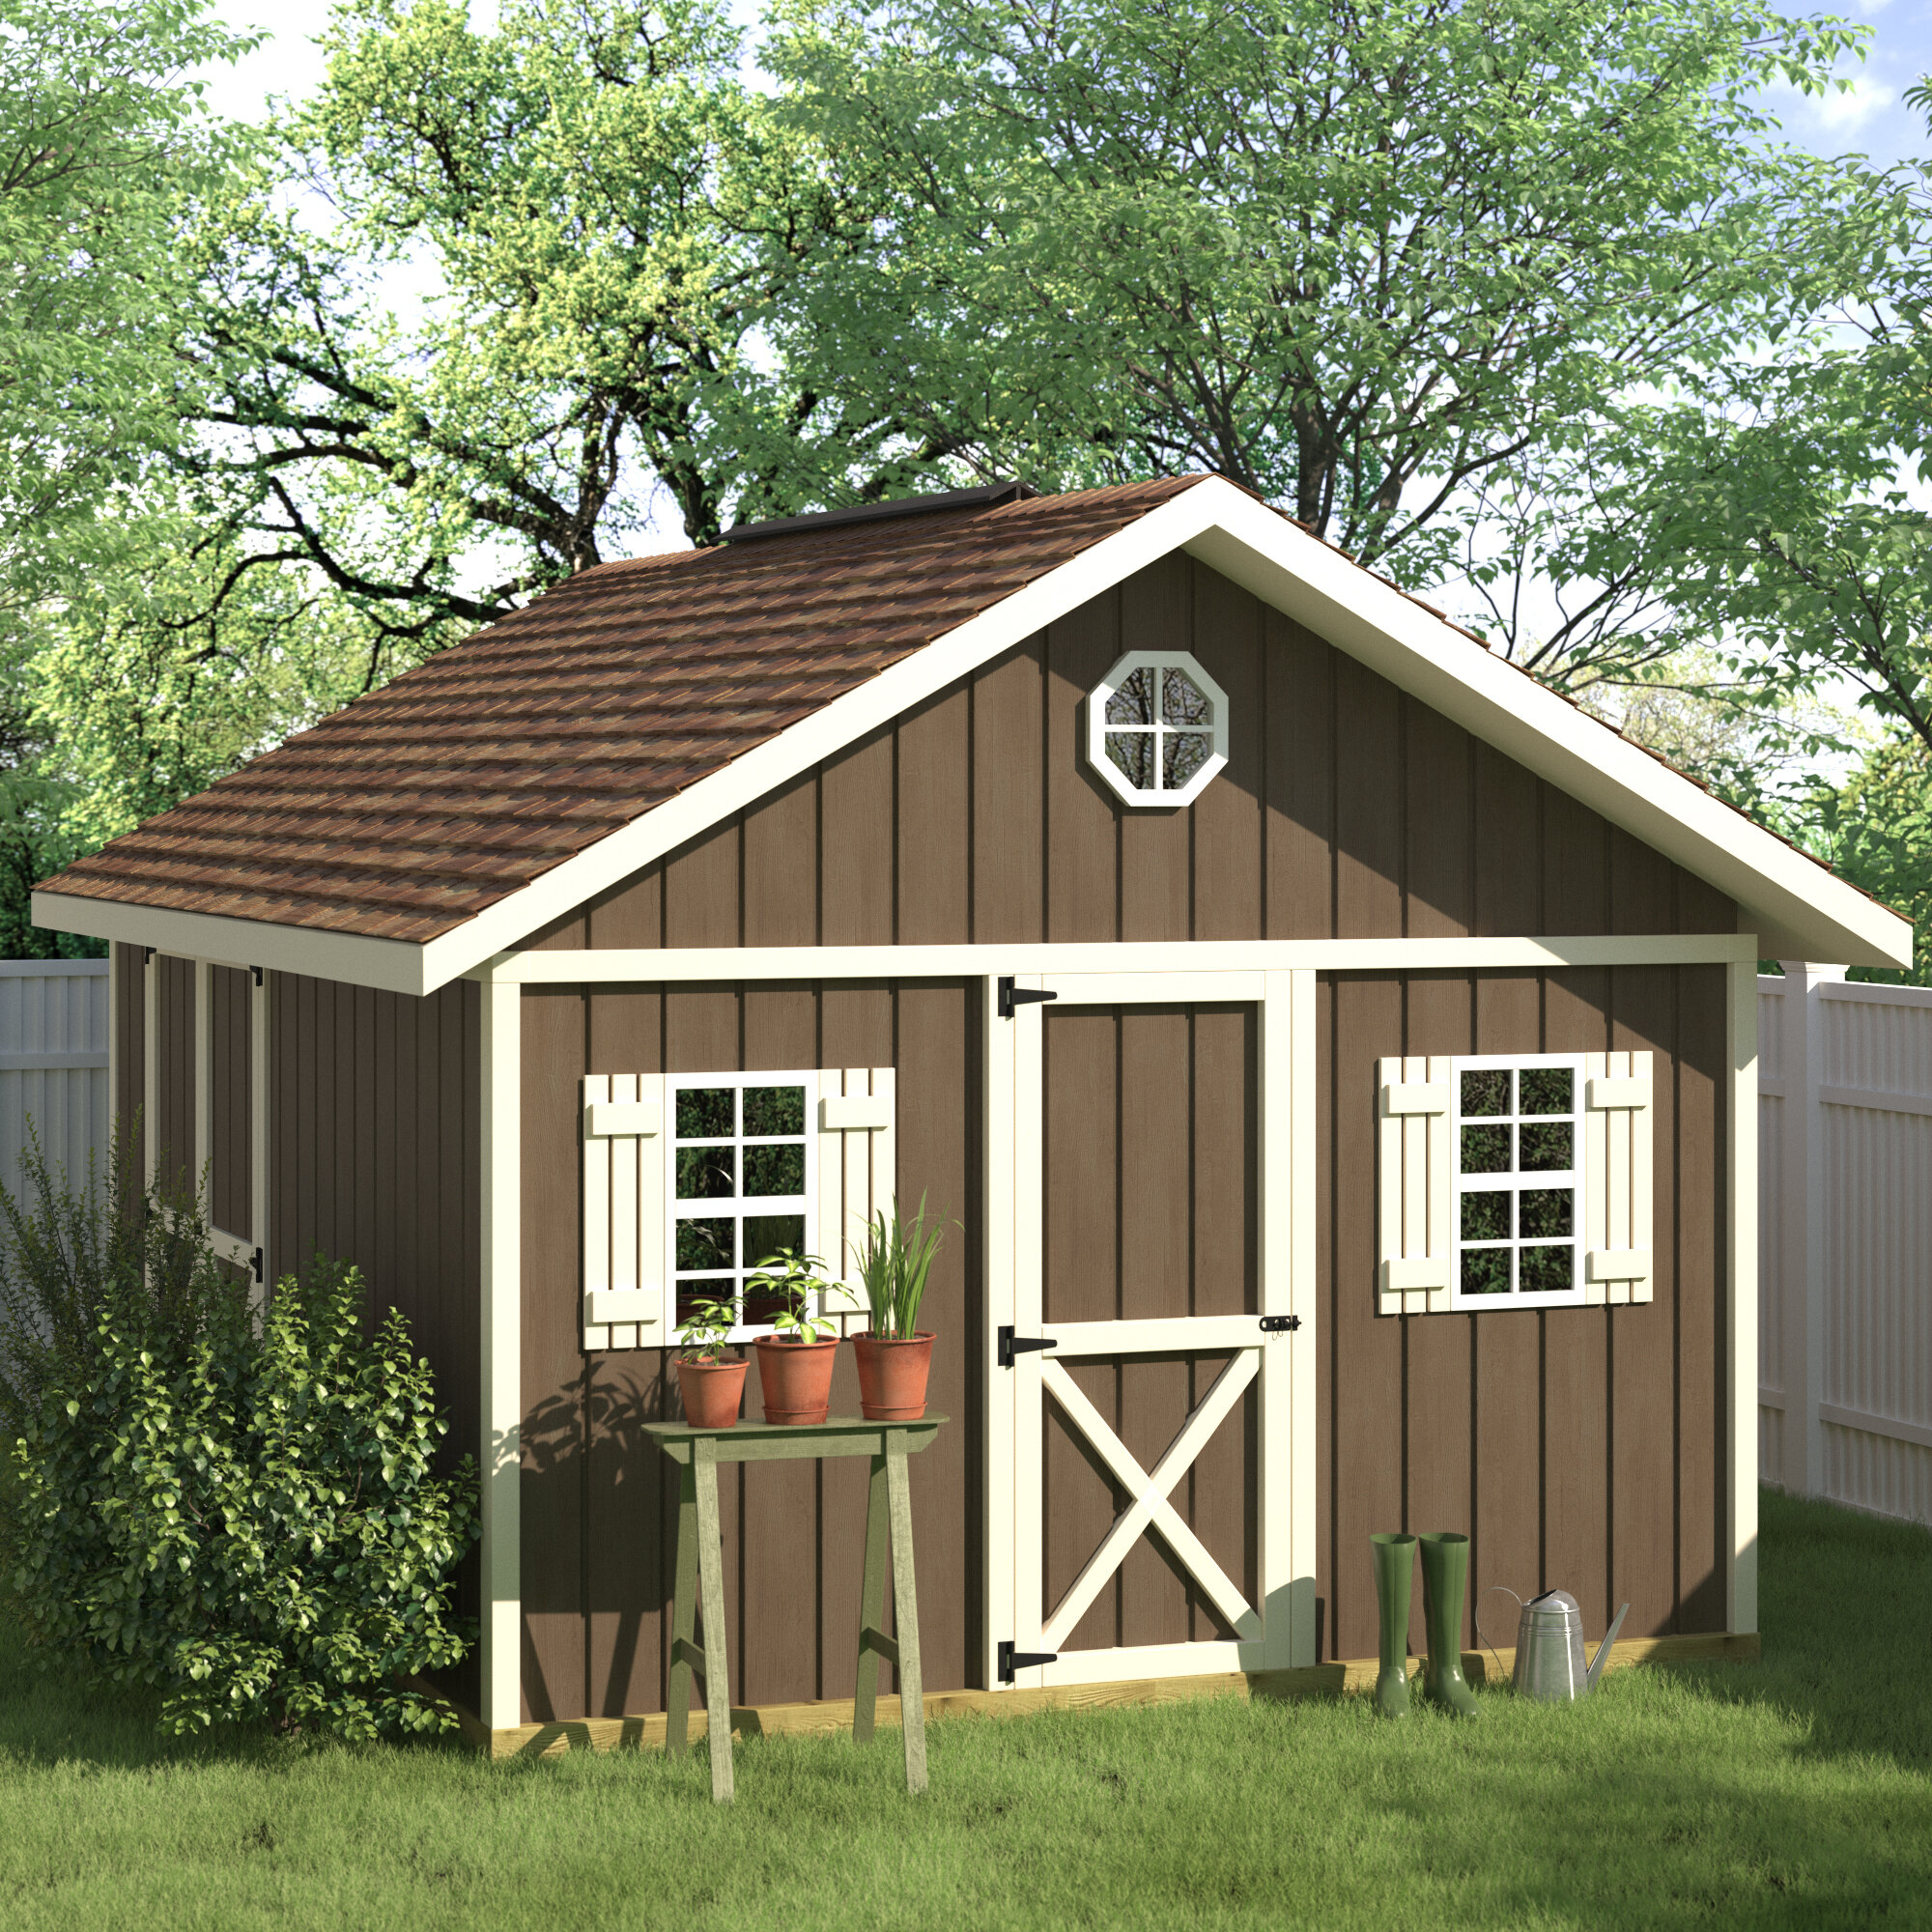 Fir Spruce Wood Storage Shed